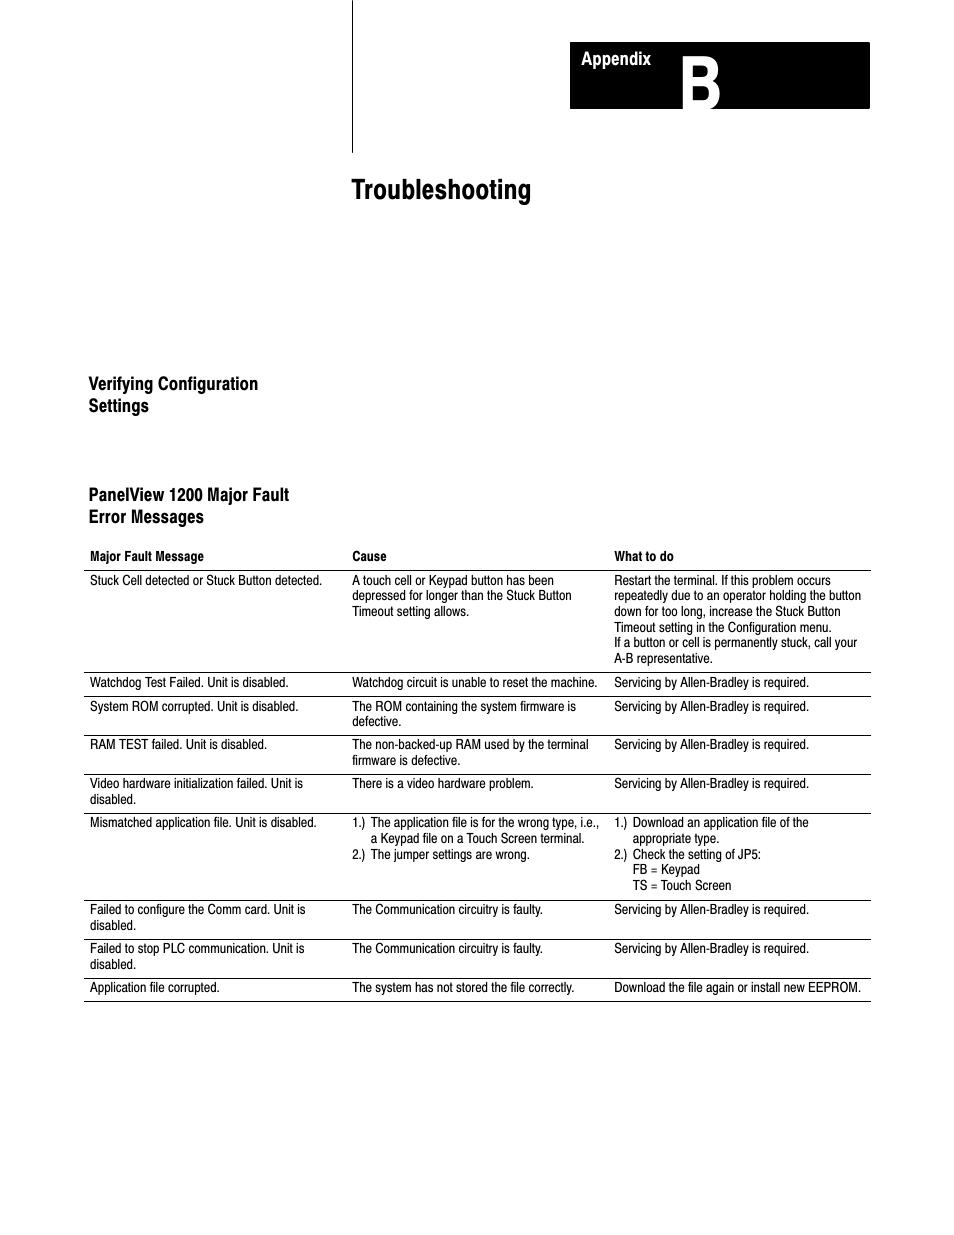 B - troubleshooting, Verifying configuration settings, Panelview